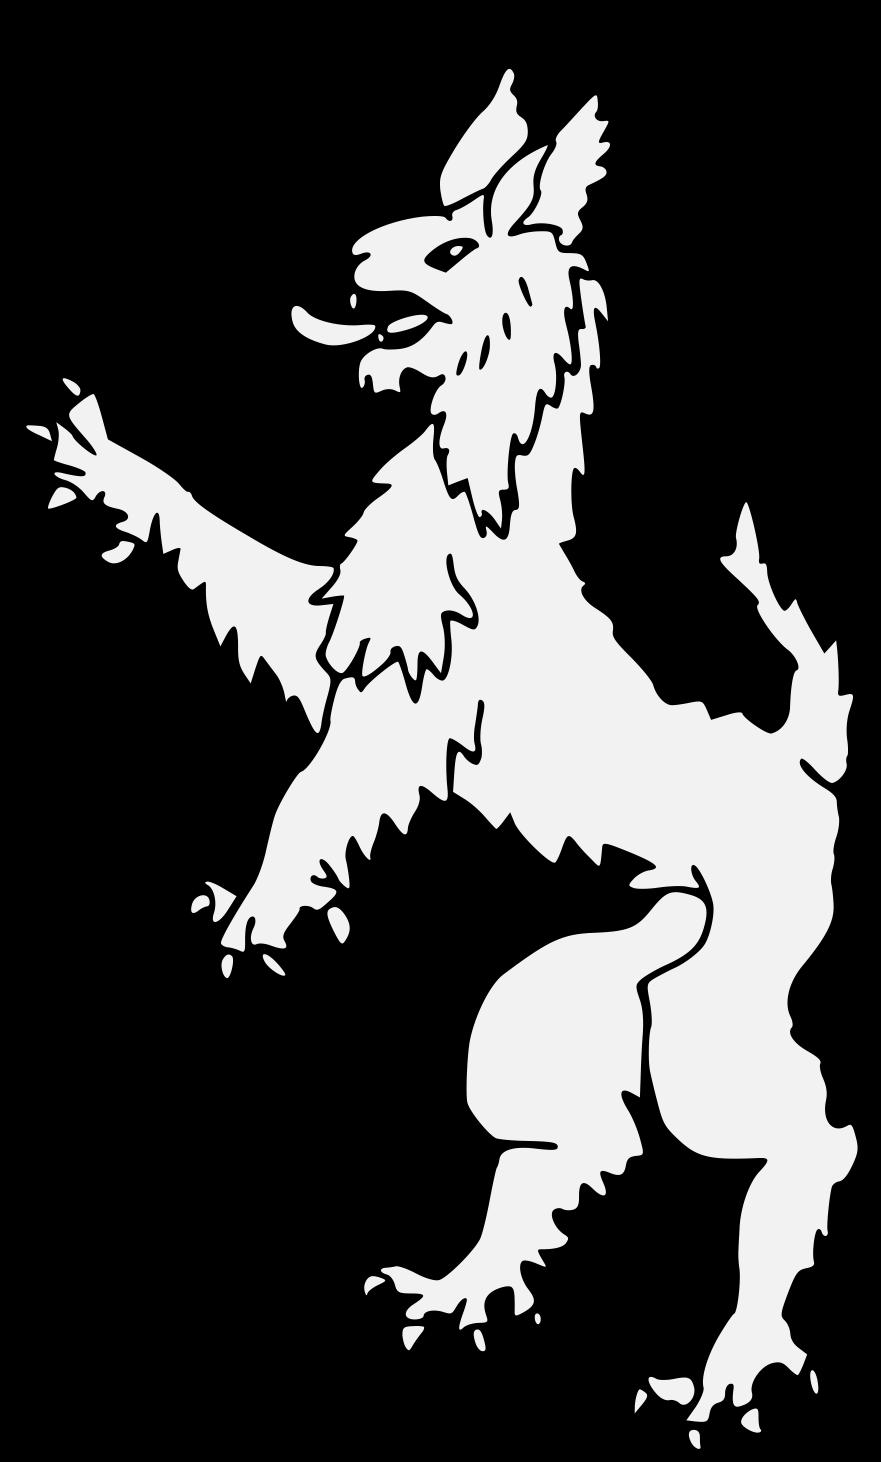 Wildcat clipart lynx. Traceable heraldic art pdf